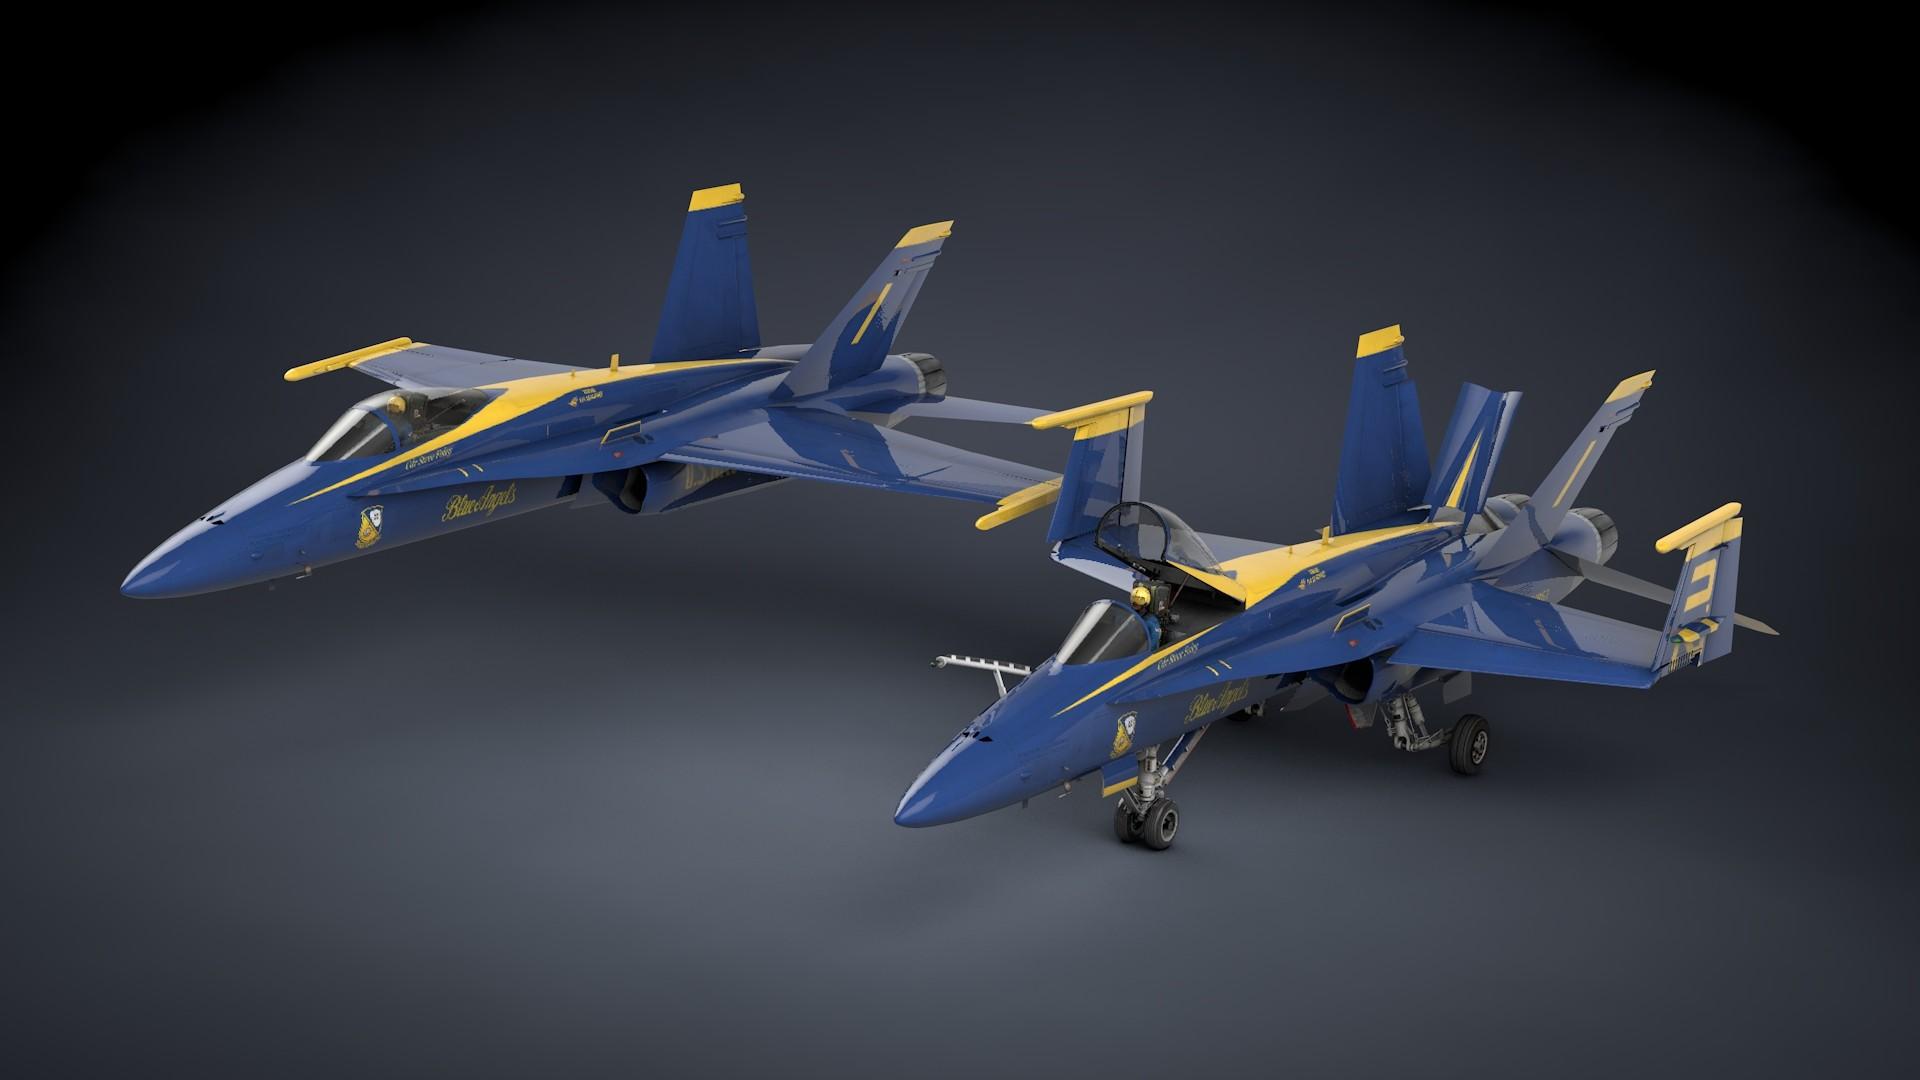 F-18A_Blue Angels_V3_1.jpg